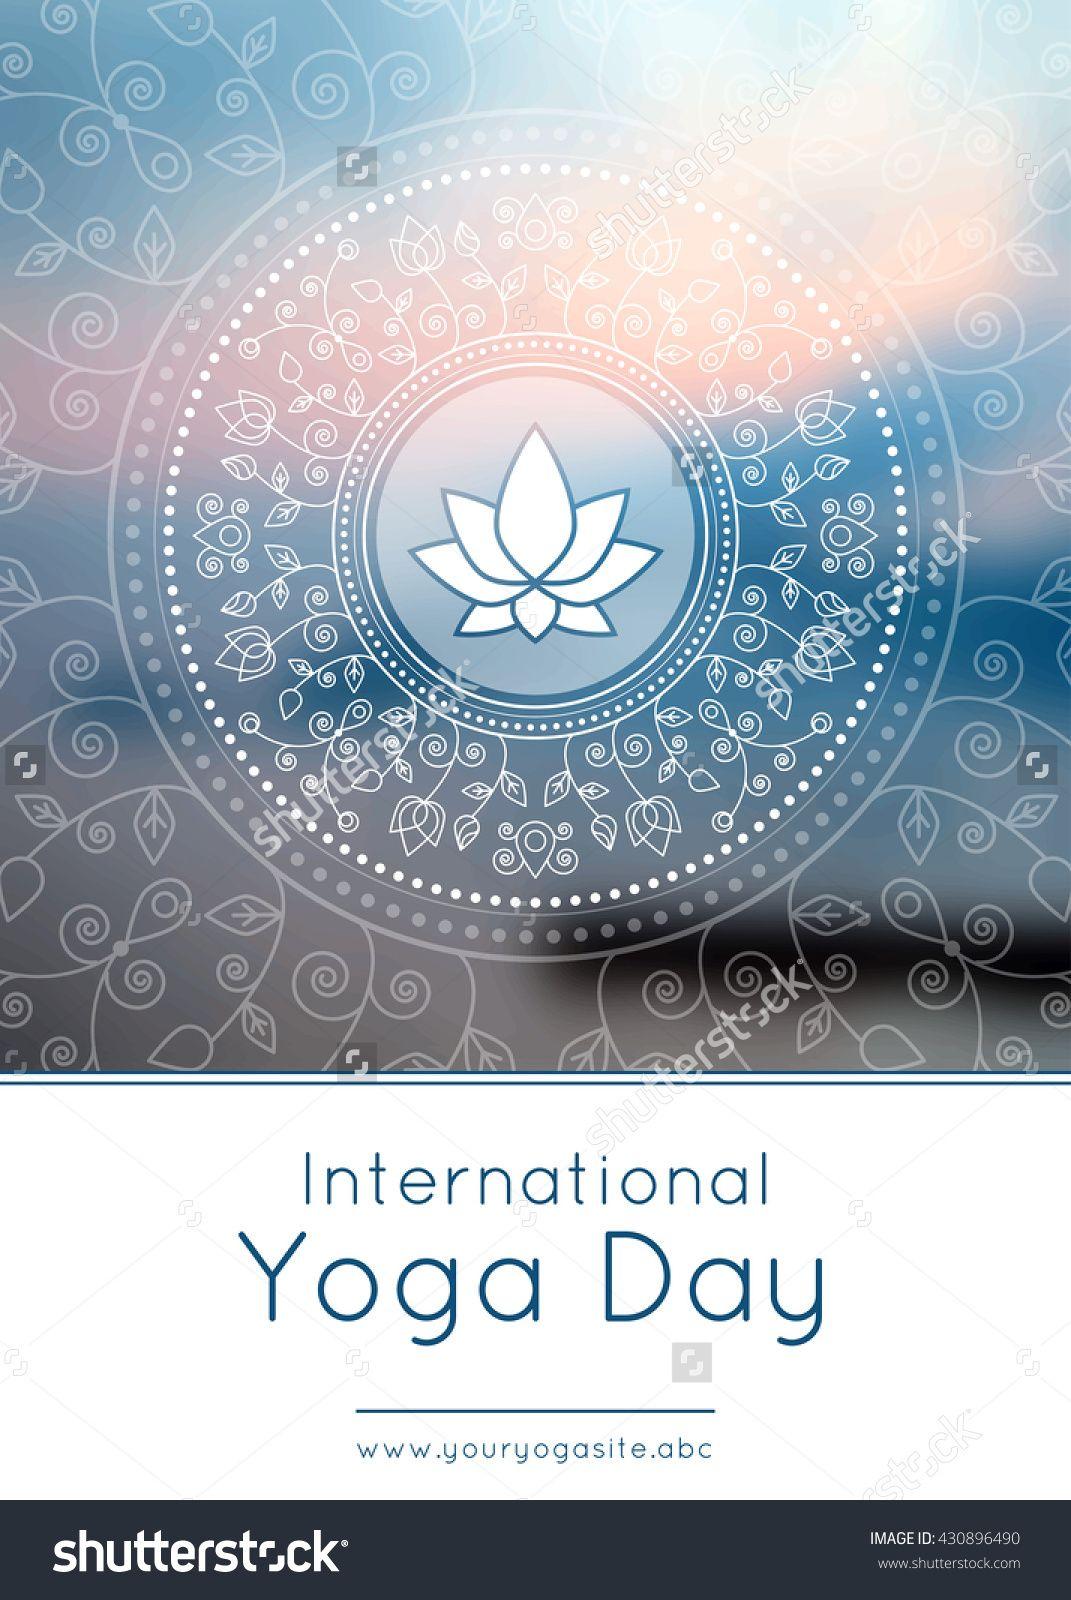 Vector Yoga Illustration Template Of Poster For International